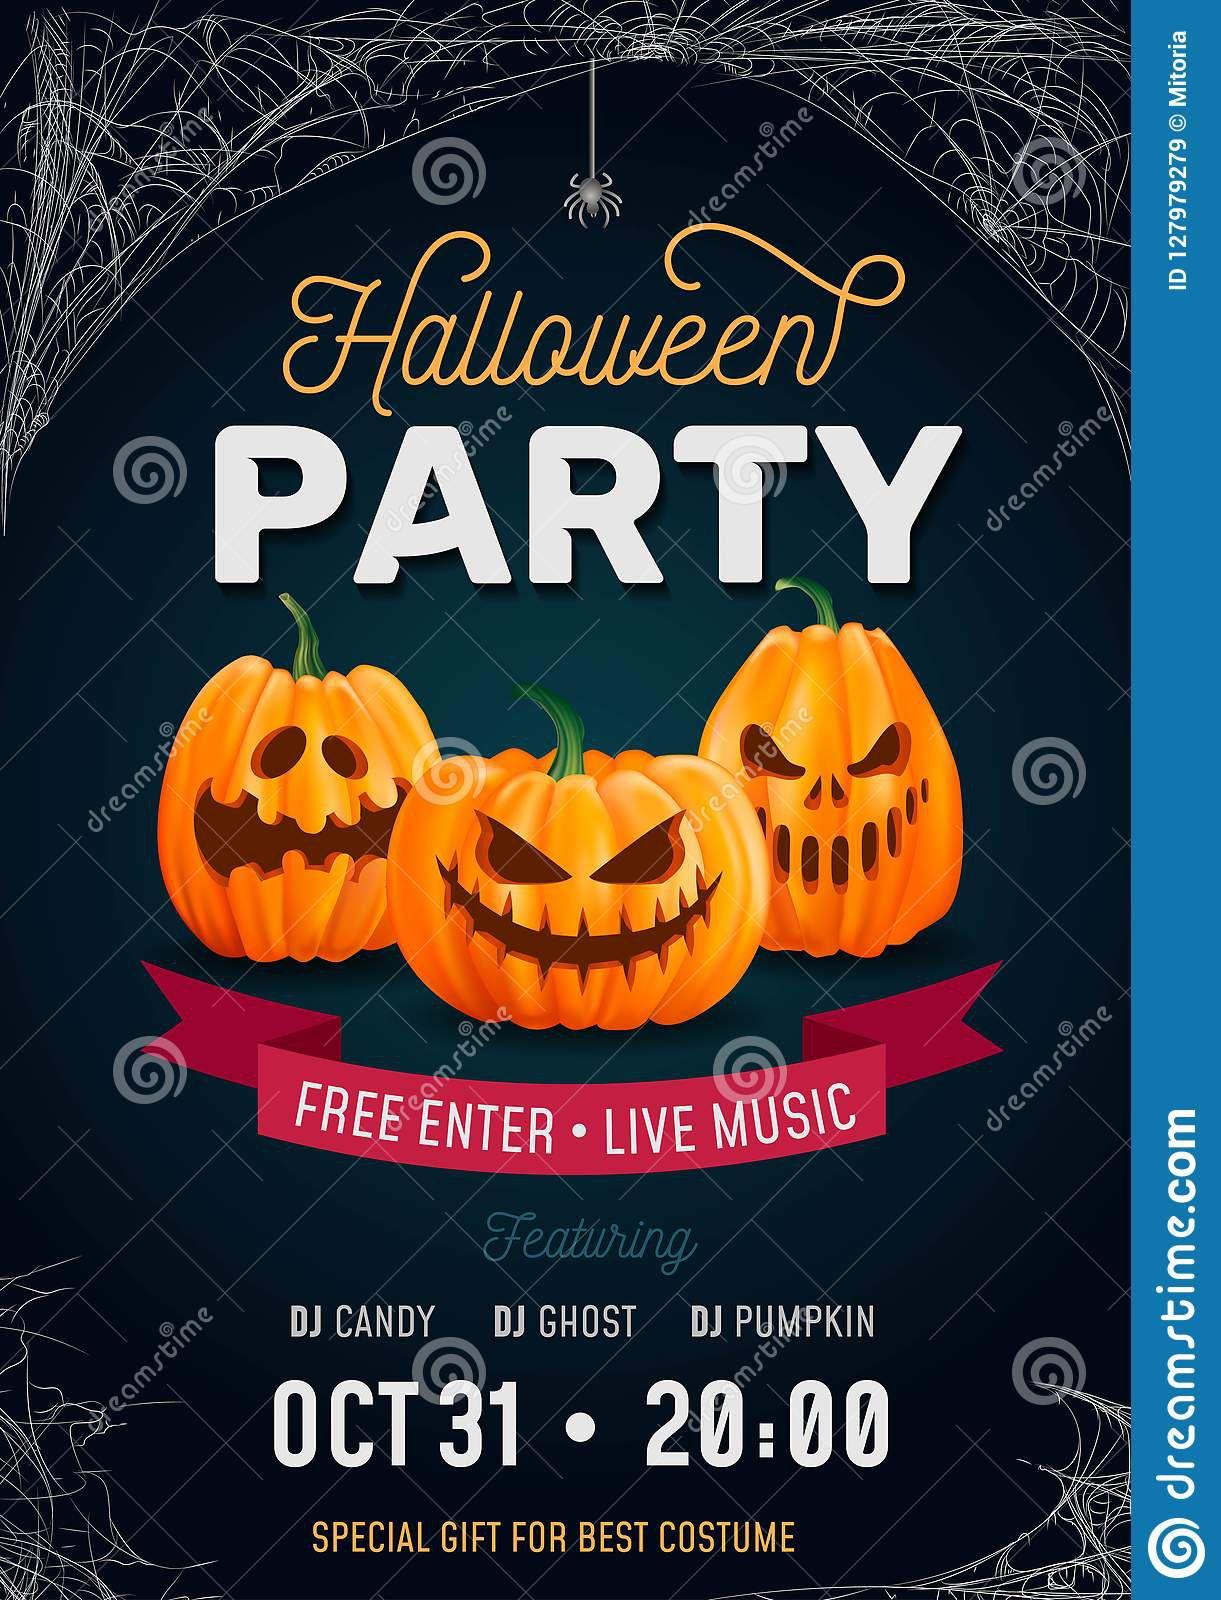 001 Surprising Free Halloween Invitation Template Highest Clarity  Templates Microsoft Word Wedding Printable PartyFull